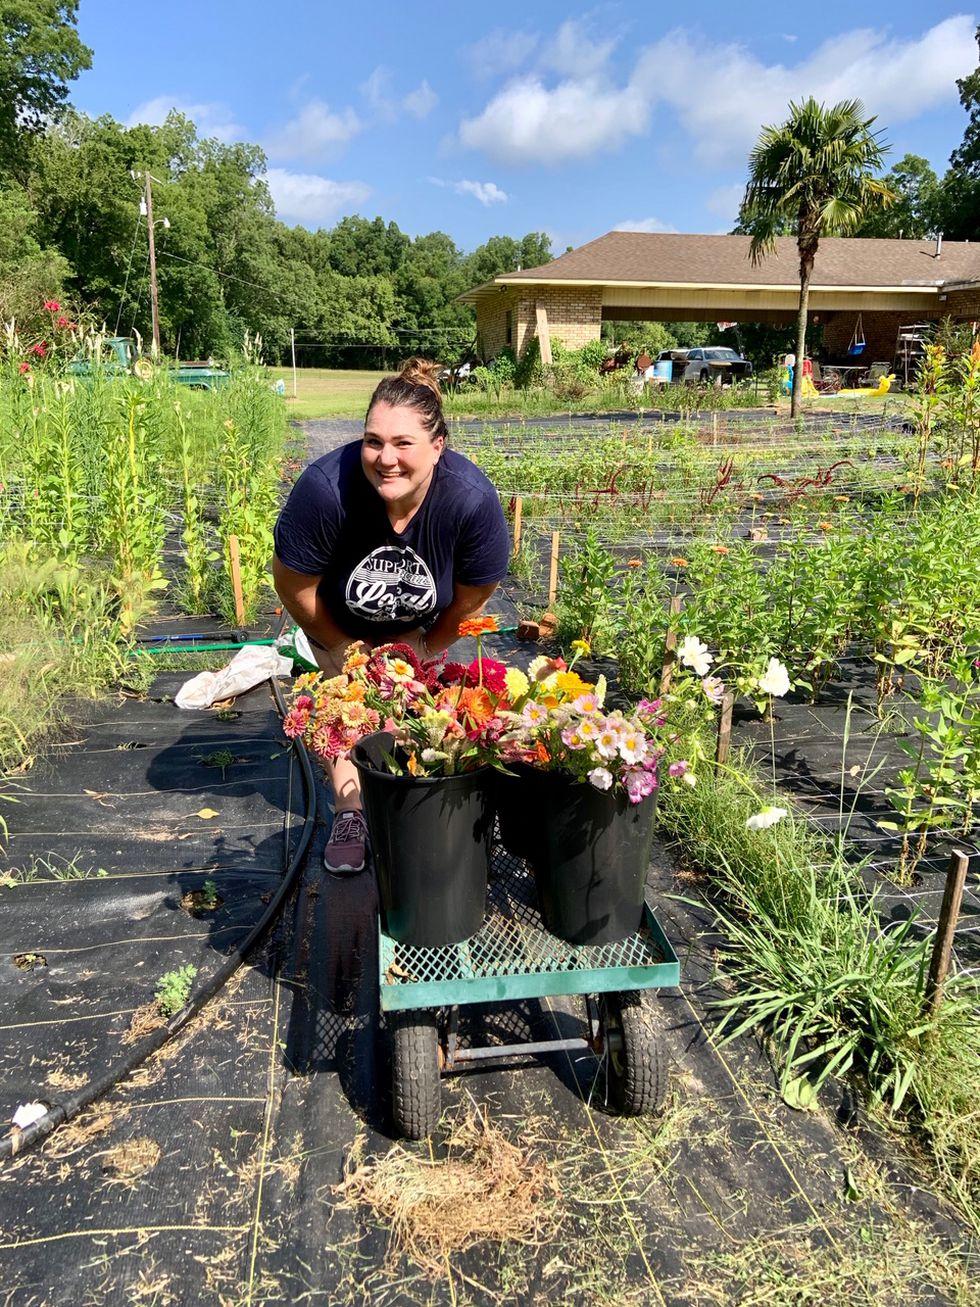 Rachel Duncan started growing flowers at her Boyce home last summer.